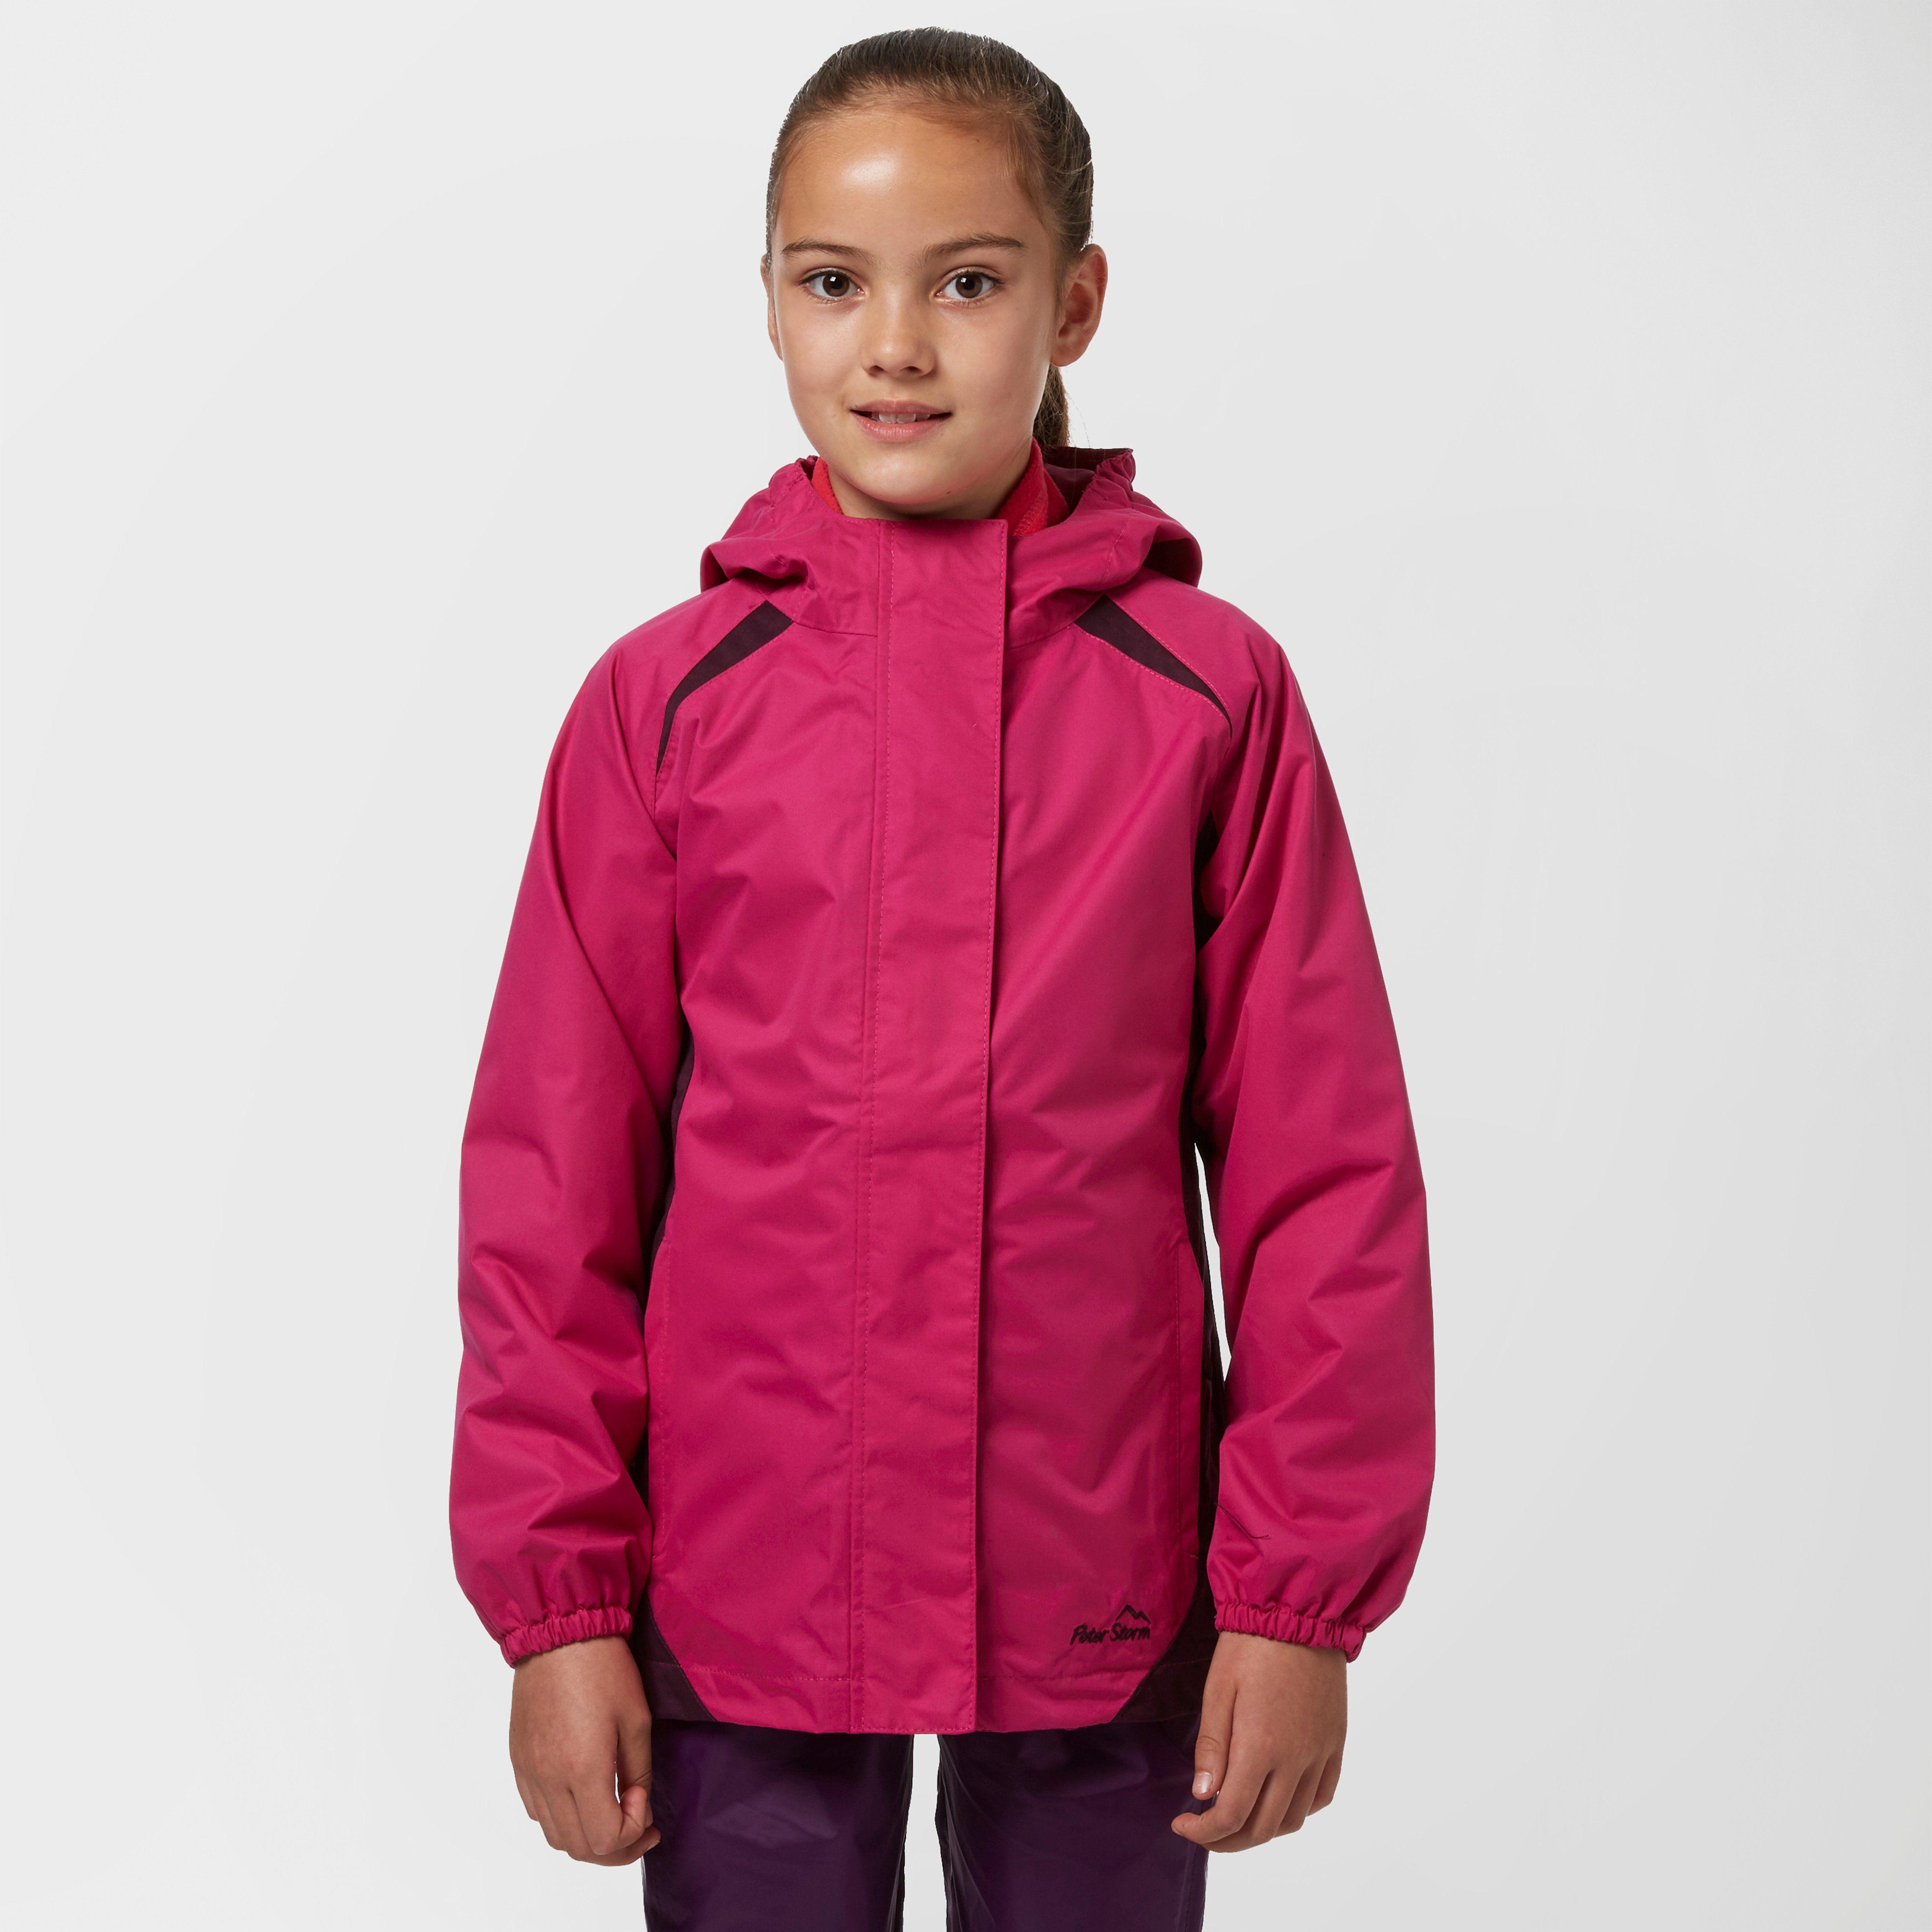 PETER STORM Girl's Panel Jacket